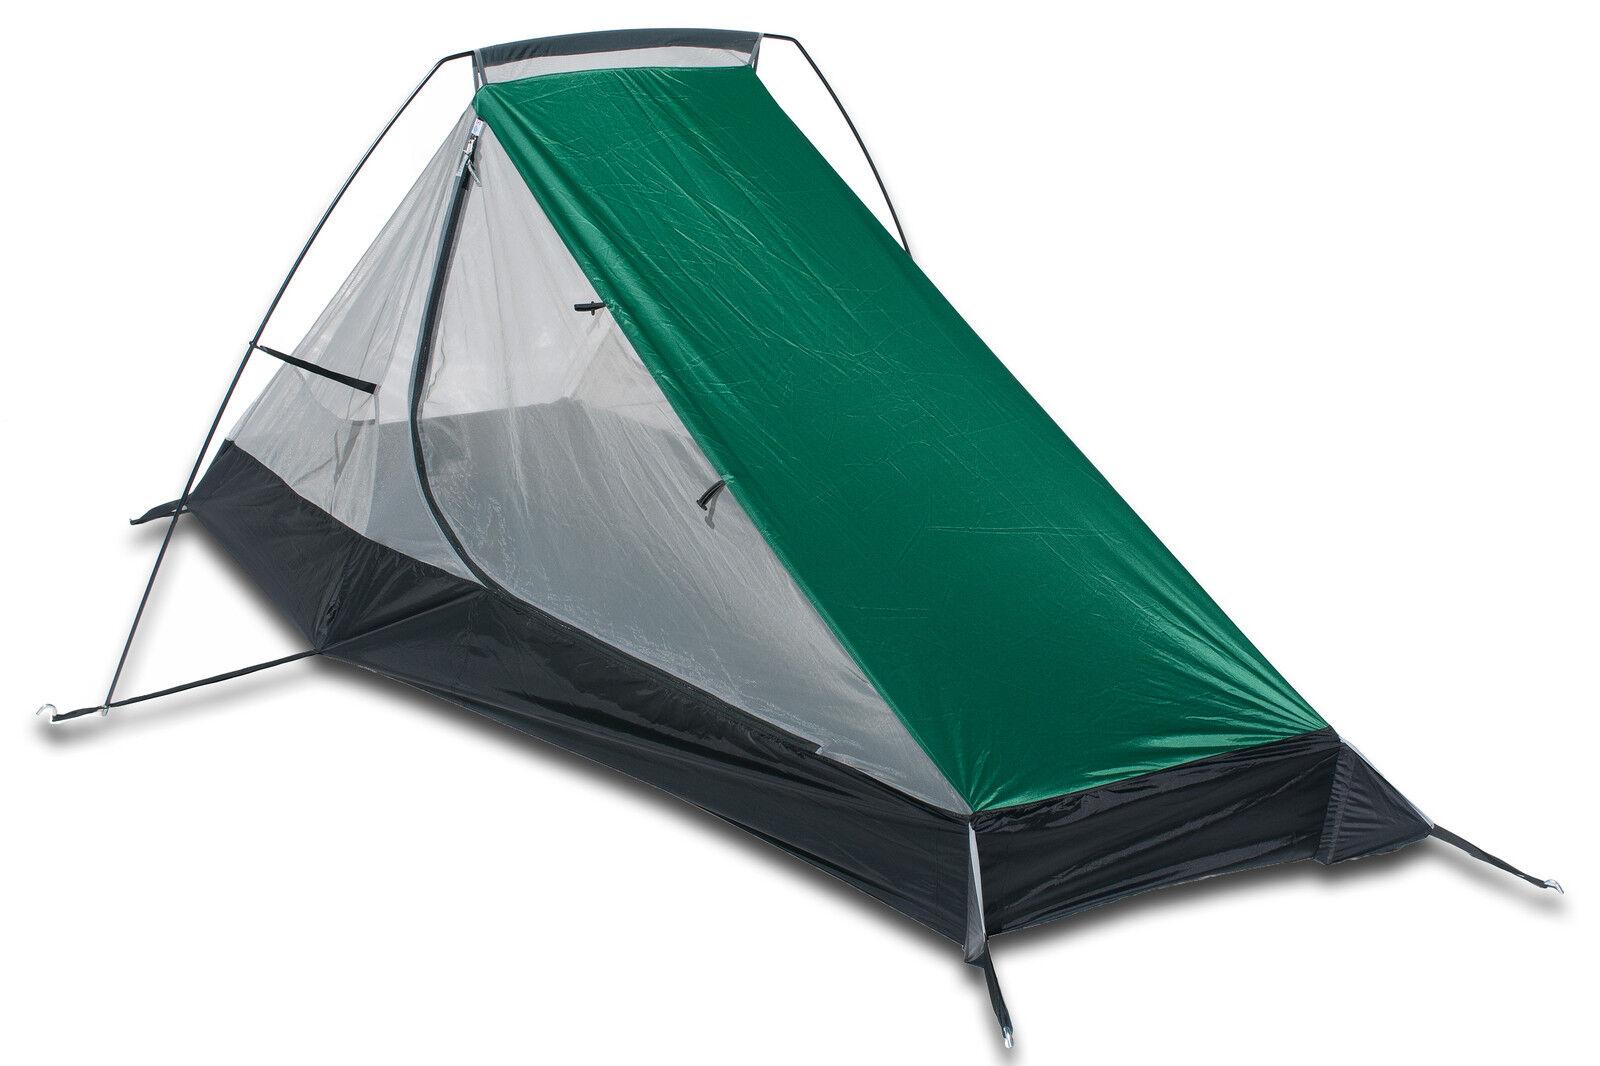 Aqua Quest West Coast Bivy Tent - One Person Single Pole Shelter - Green & White